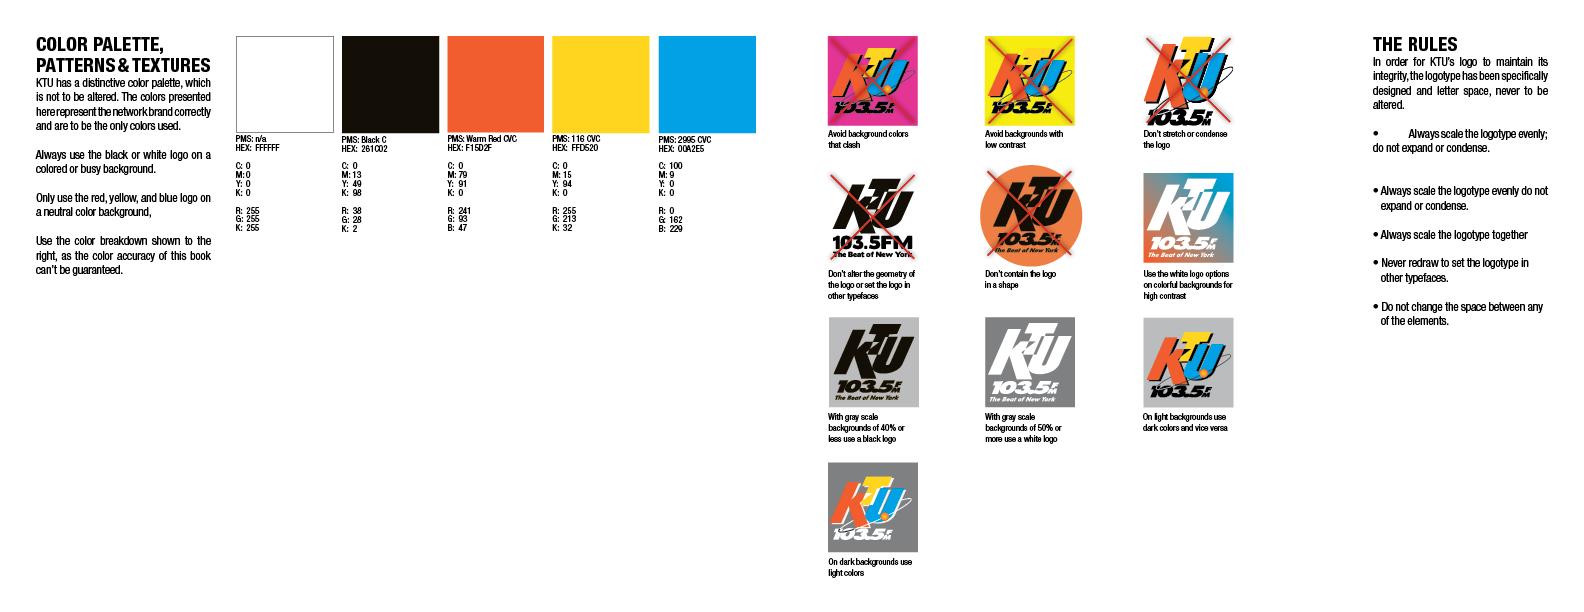 KTU Brand Guidelines3.png